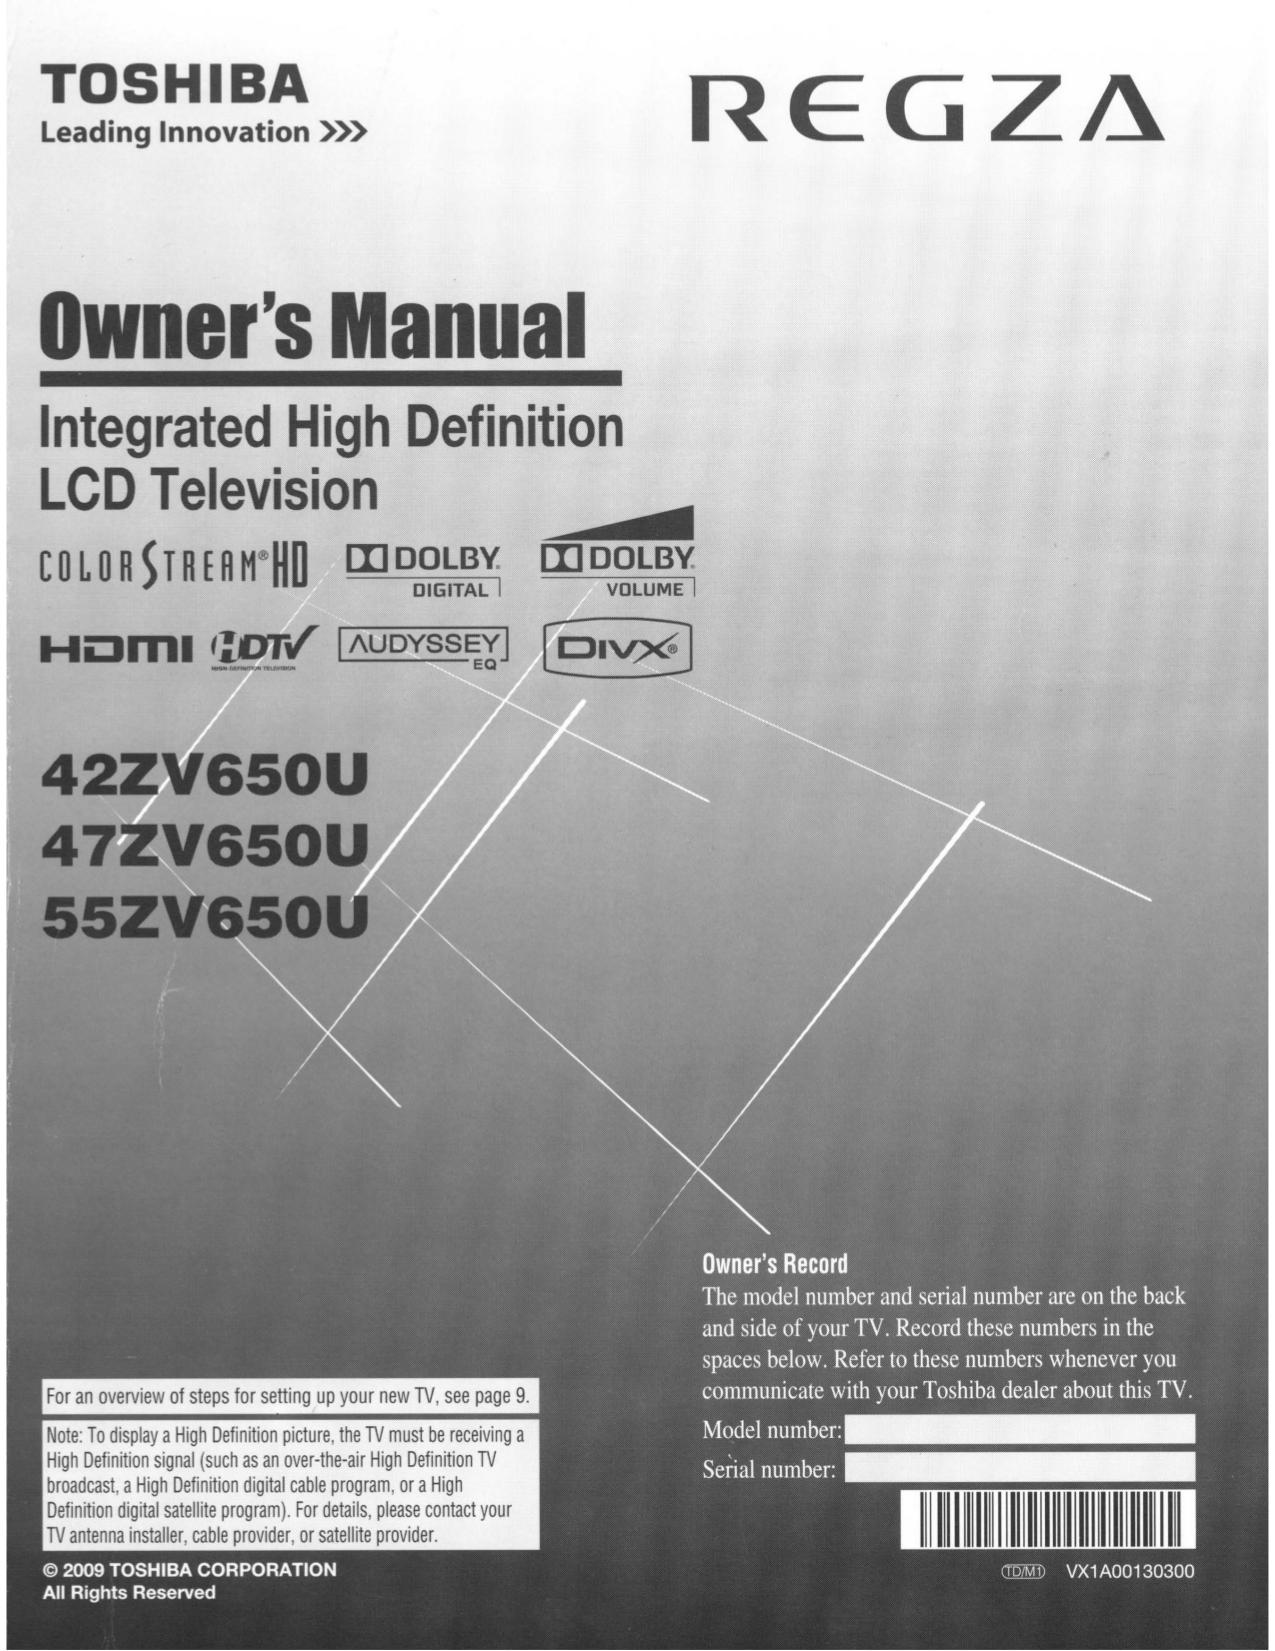 download free pdf for toshiba regza 47zv650u tv manual rh umlib com toshiba regza 42x3030d tv manual toshiba regza 42x3030d tv manual